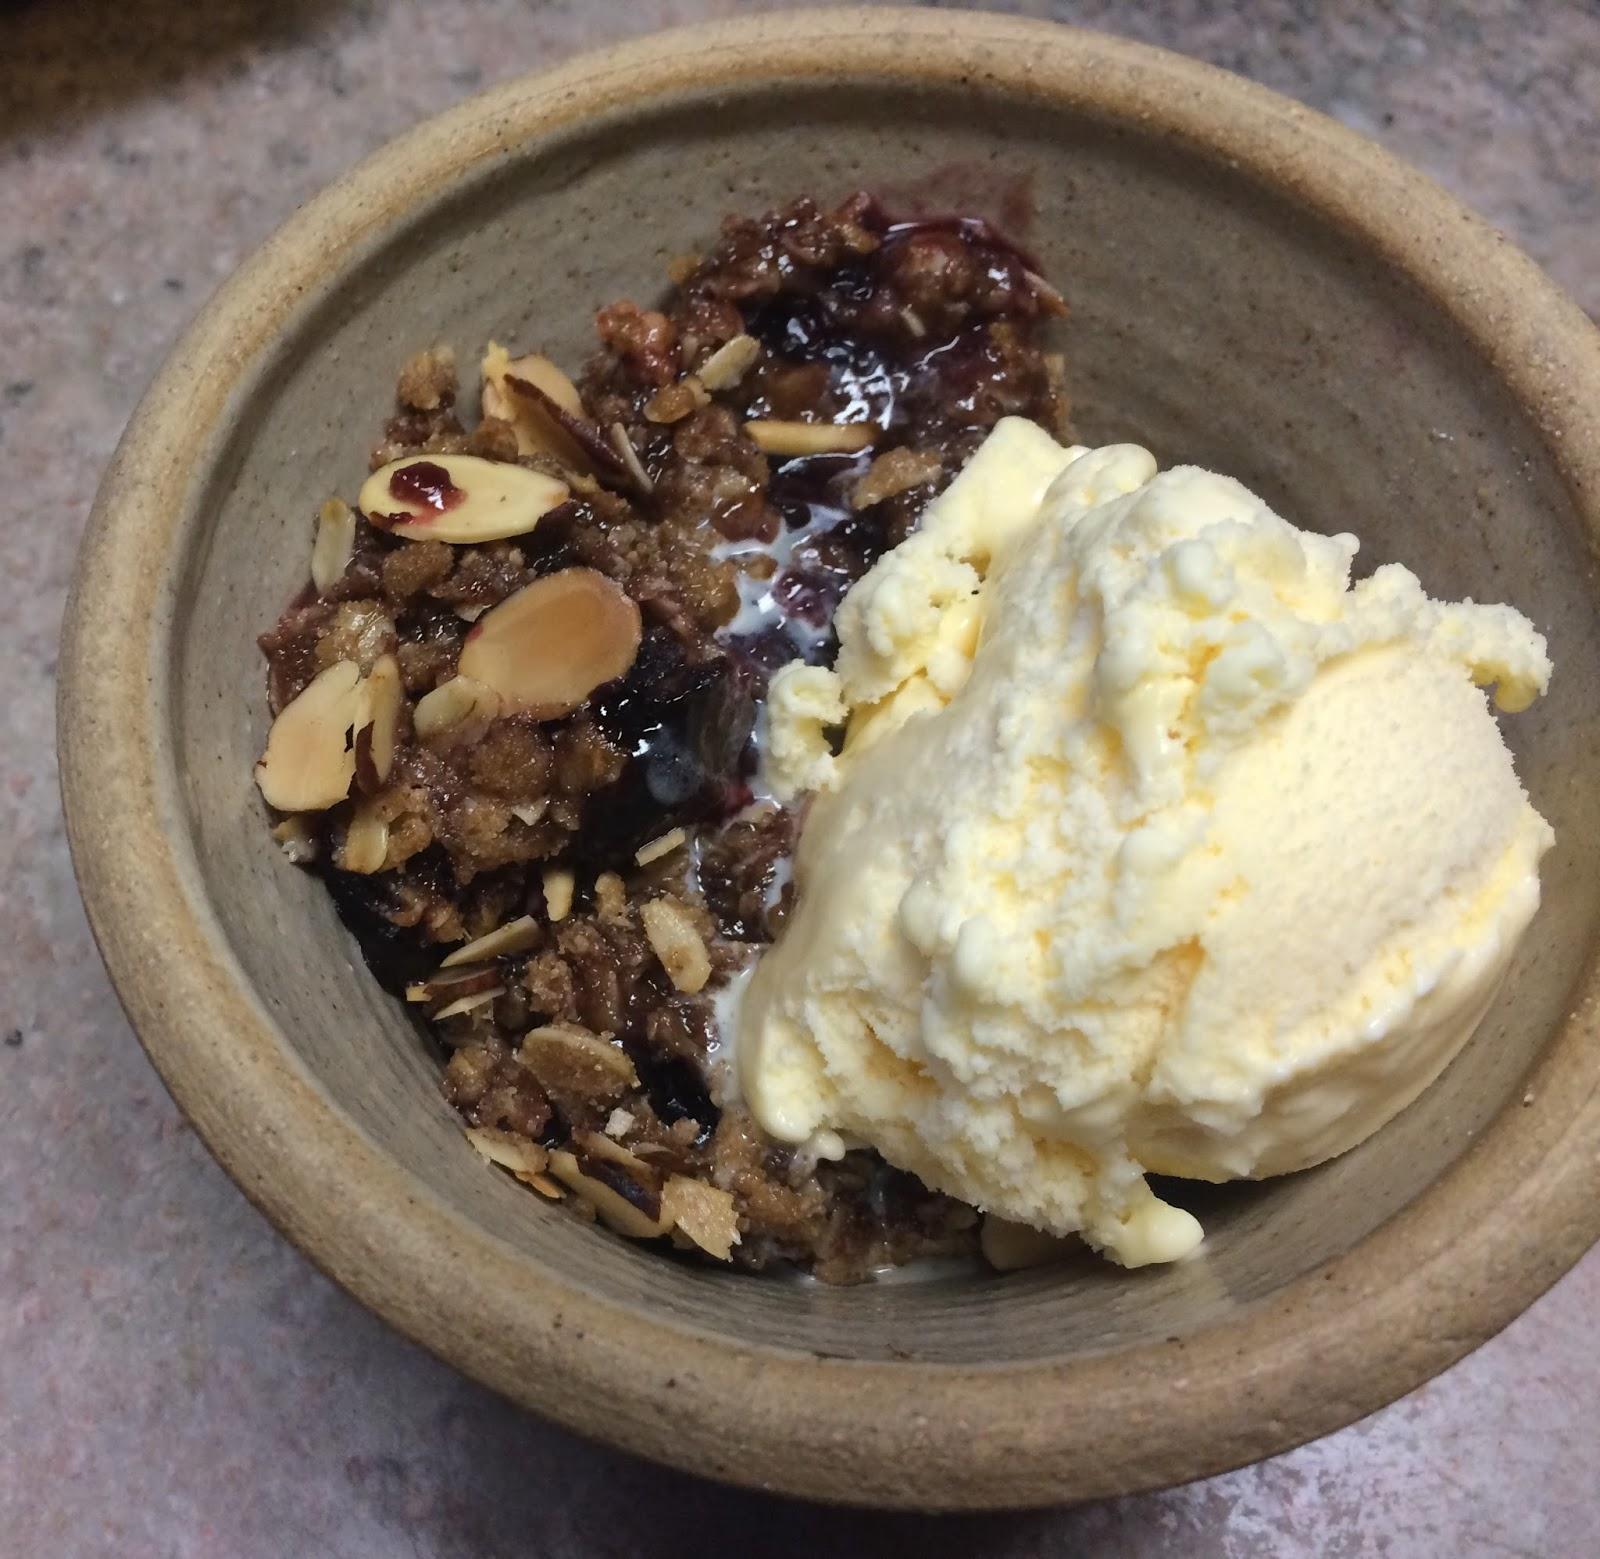 ... Barry & Meta: Blackberry Nut Crisp -- fruit & nuts paired delicio...